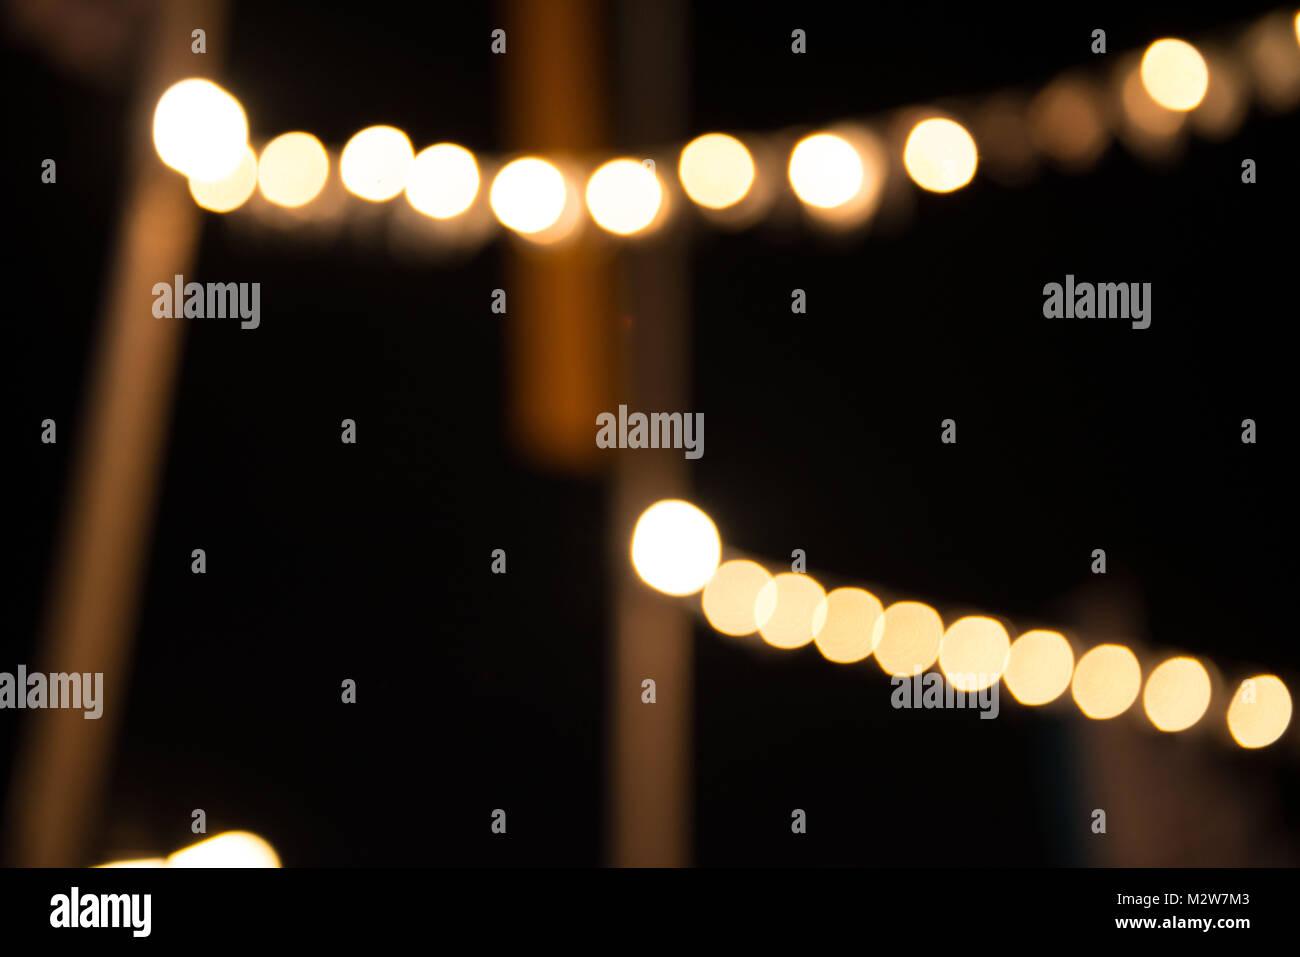 Oktoberfest, 'Wiesn' by night, lights - Stock Image